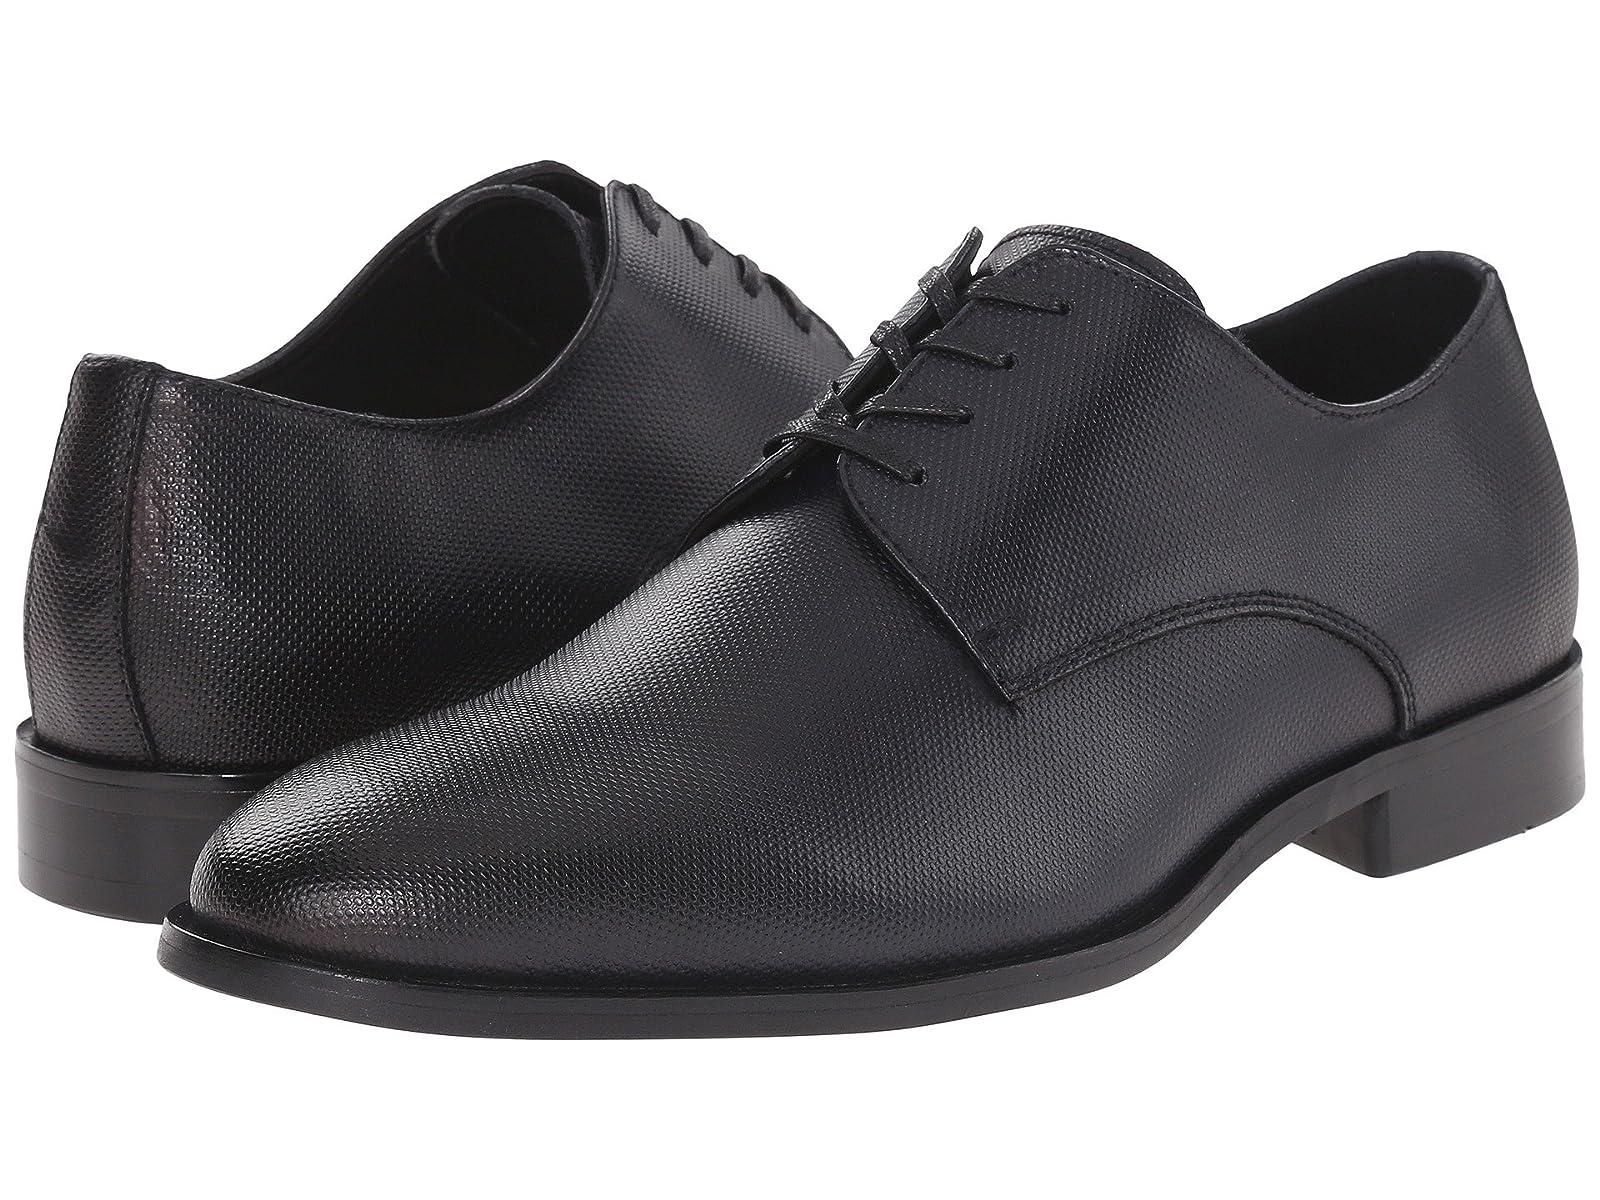 ALDO BaxCheap and distinctive eye-catching shoes